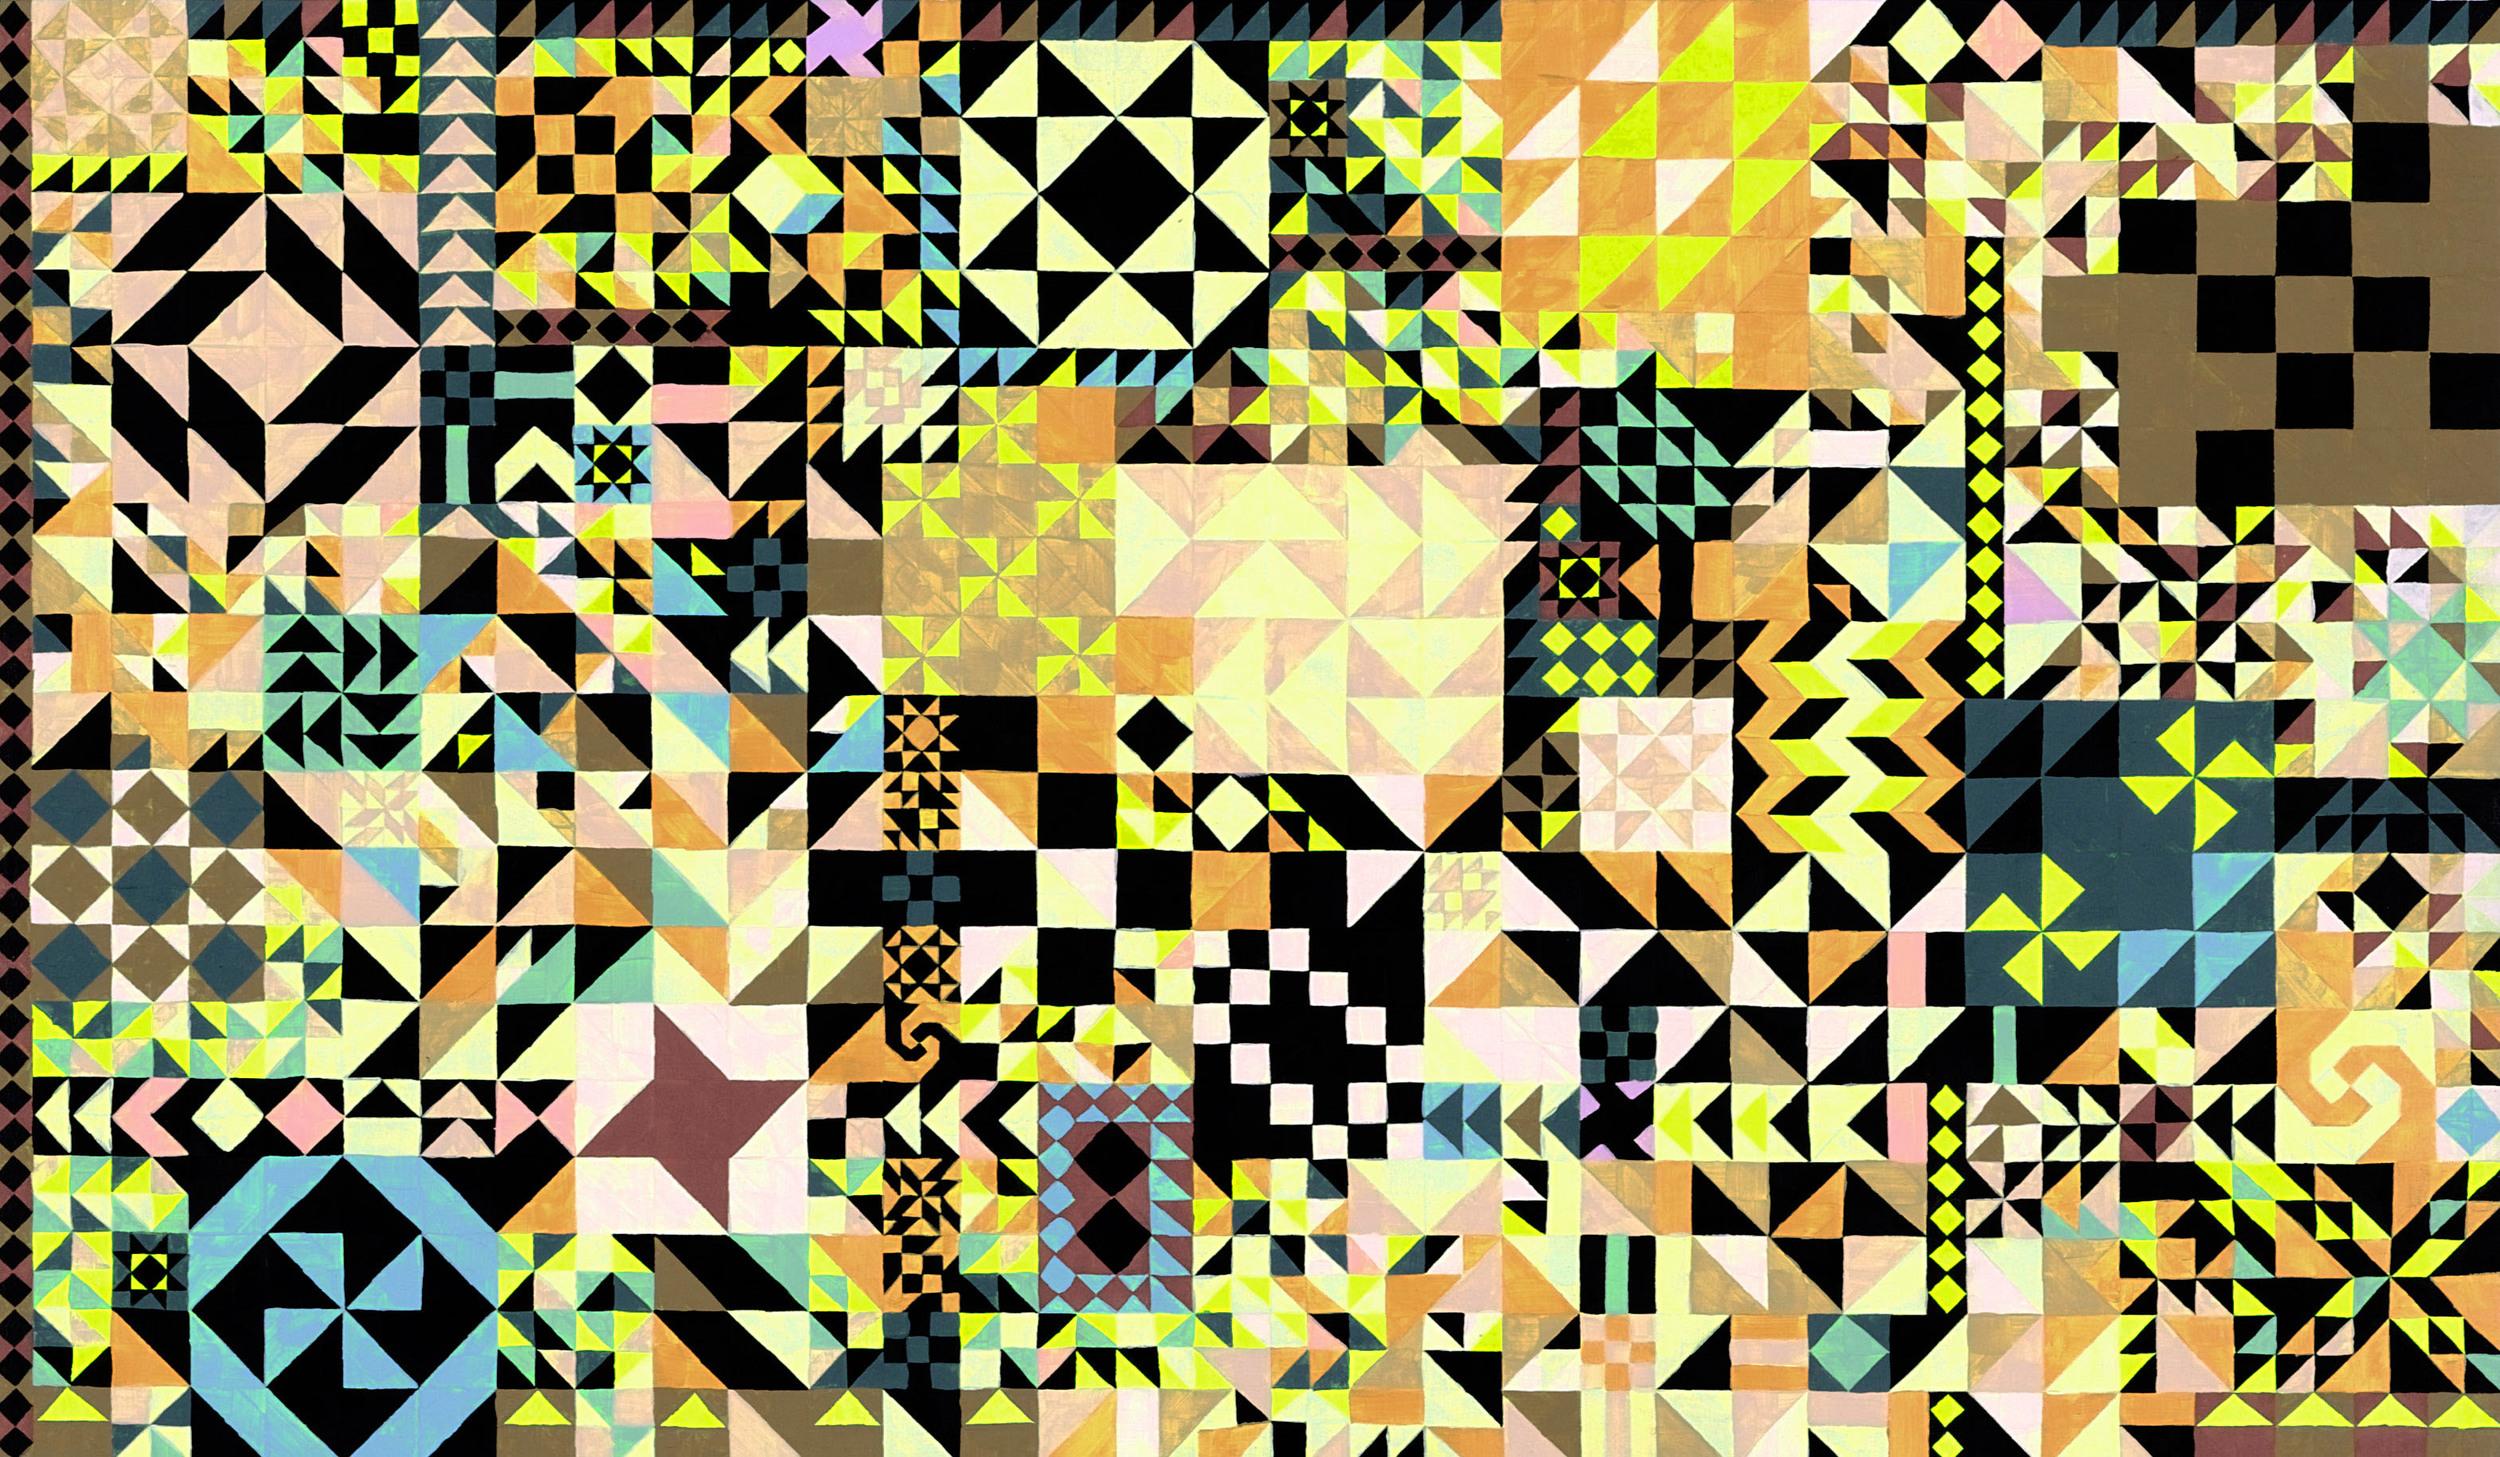 Repeat Remix, 2008 Acrylic & gouache on wood 9.6 x 15.4 inches (24.4 x 39 cm)   